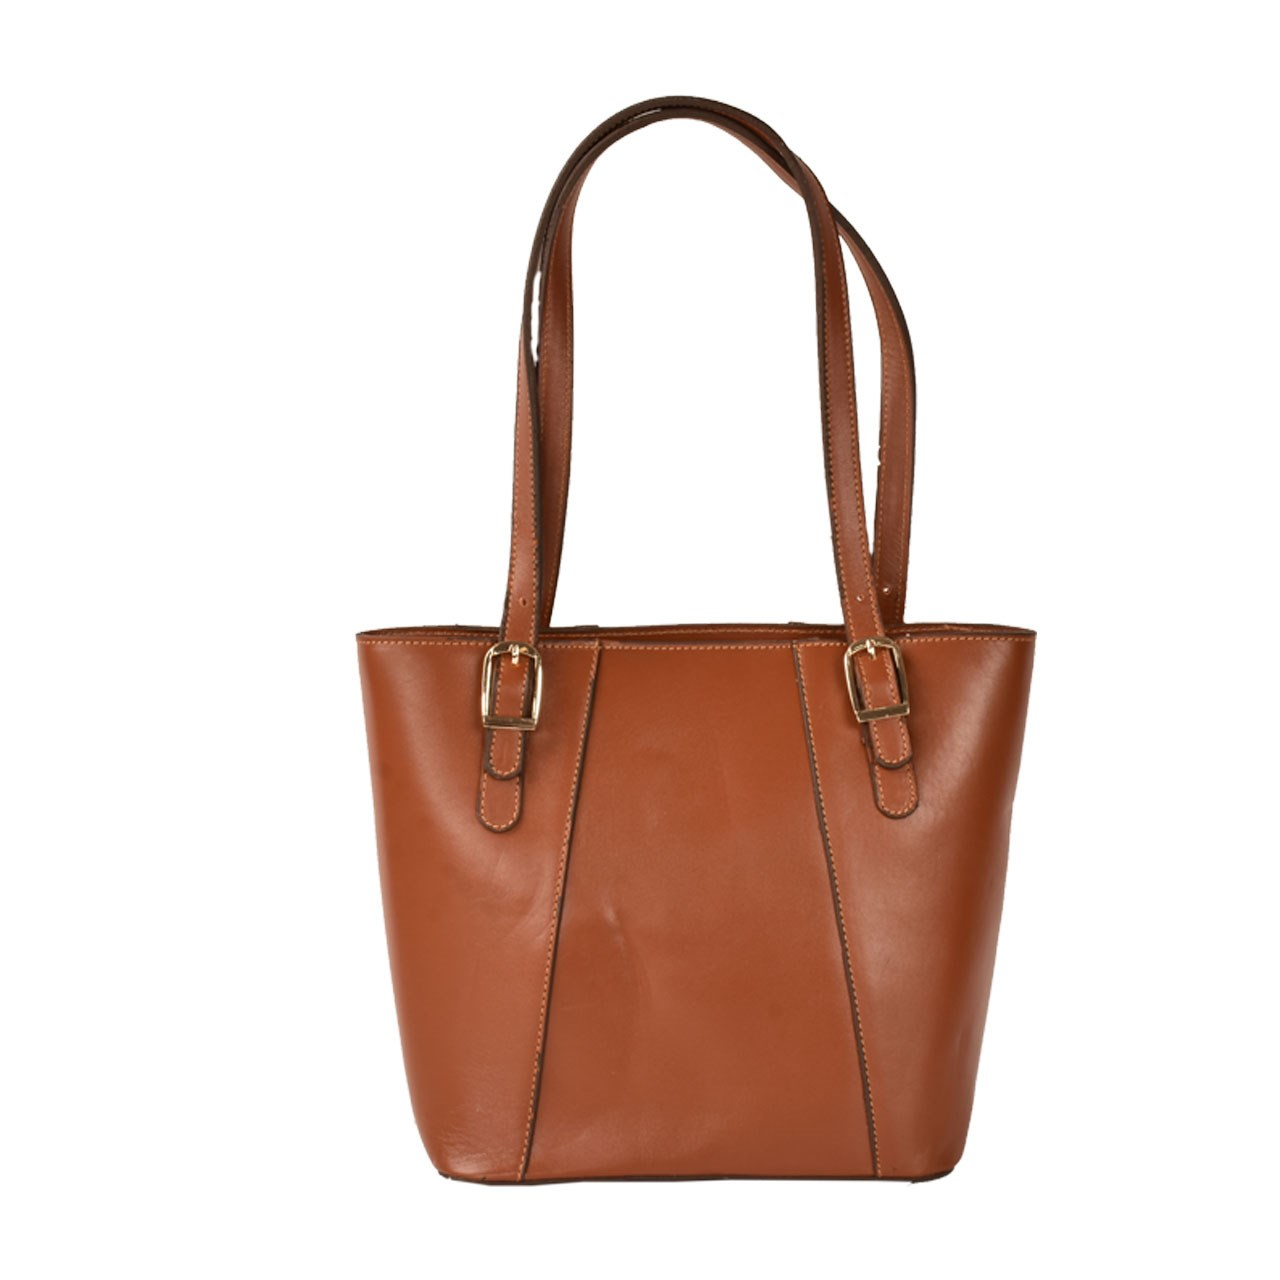 کیف دستی چرم طبیعی کهن چرم مدل V165-1